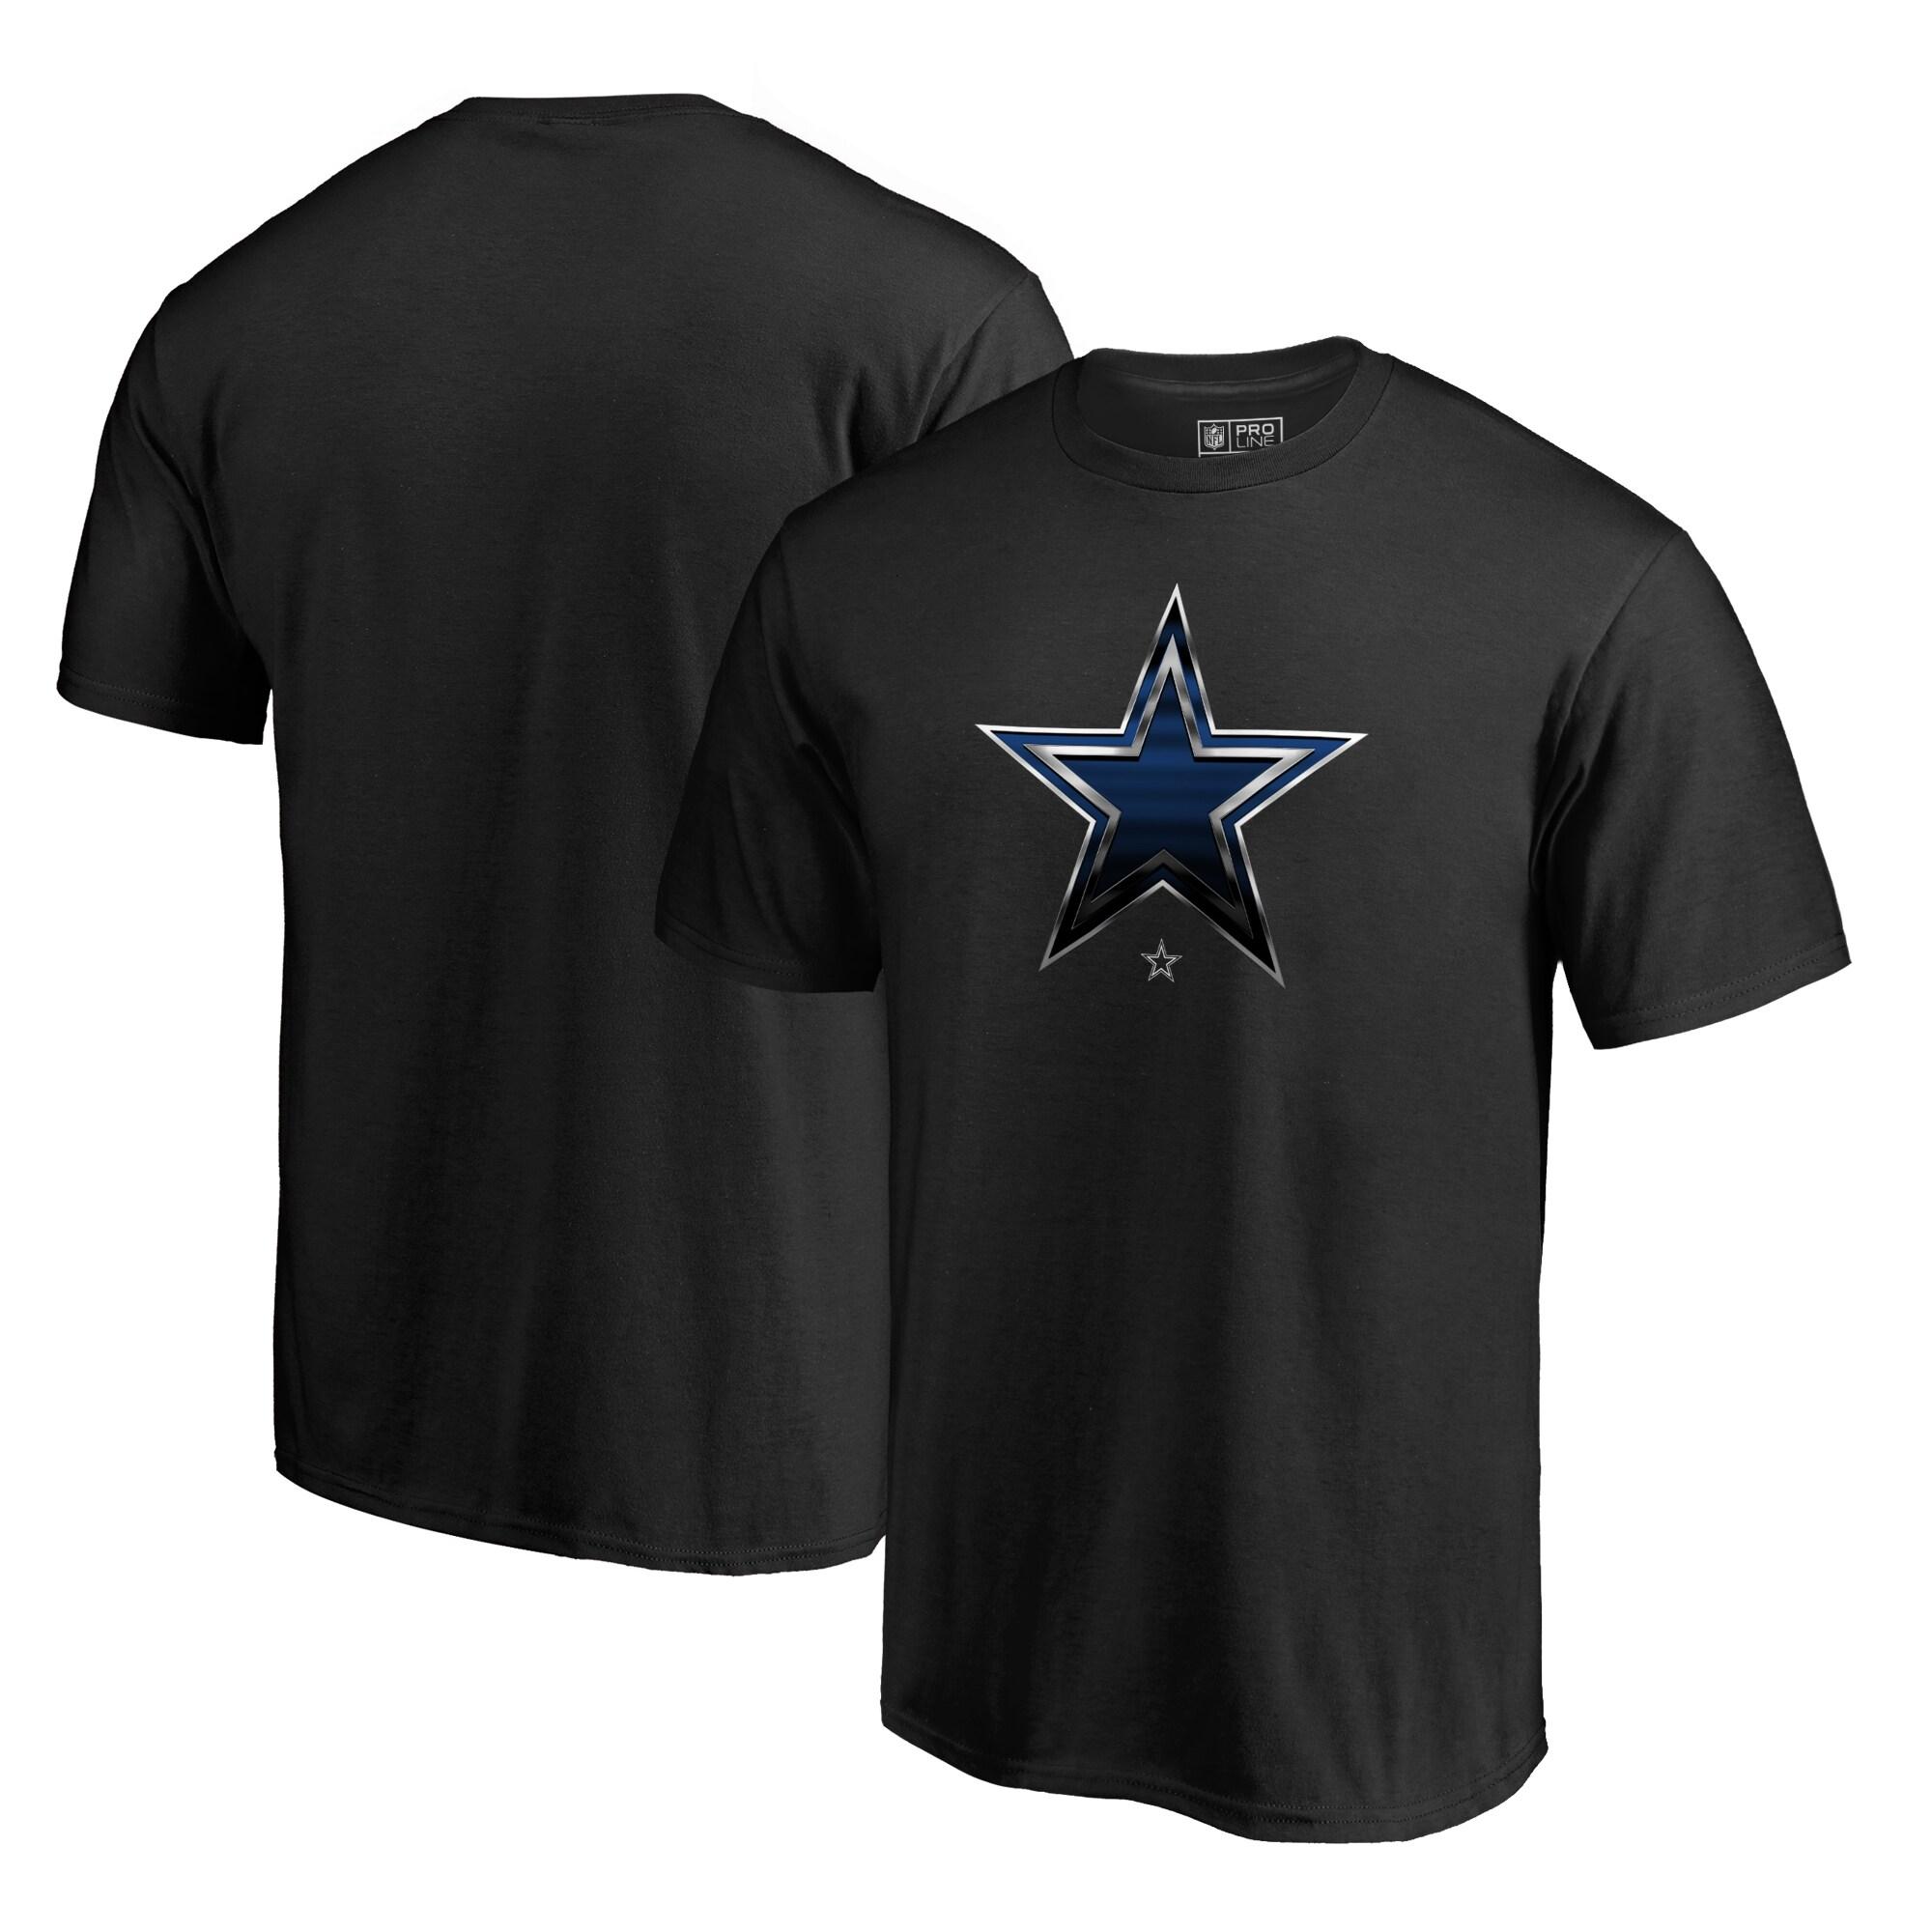 Dallas Cowboys NFL Pro Line by Fanatics Branded Midnight Mascot Big and Tall T-Shirt - Black